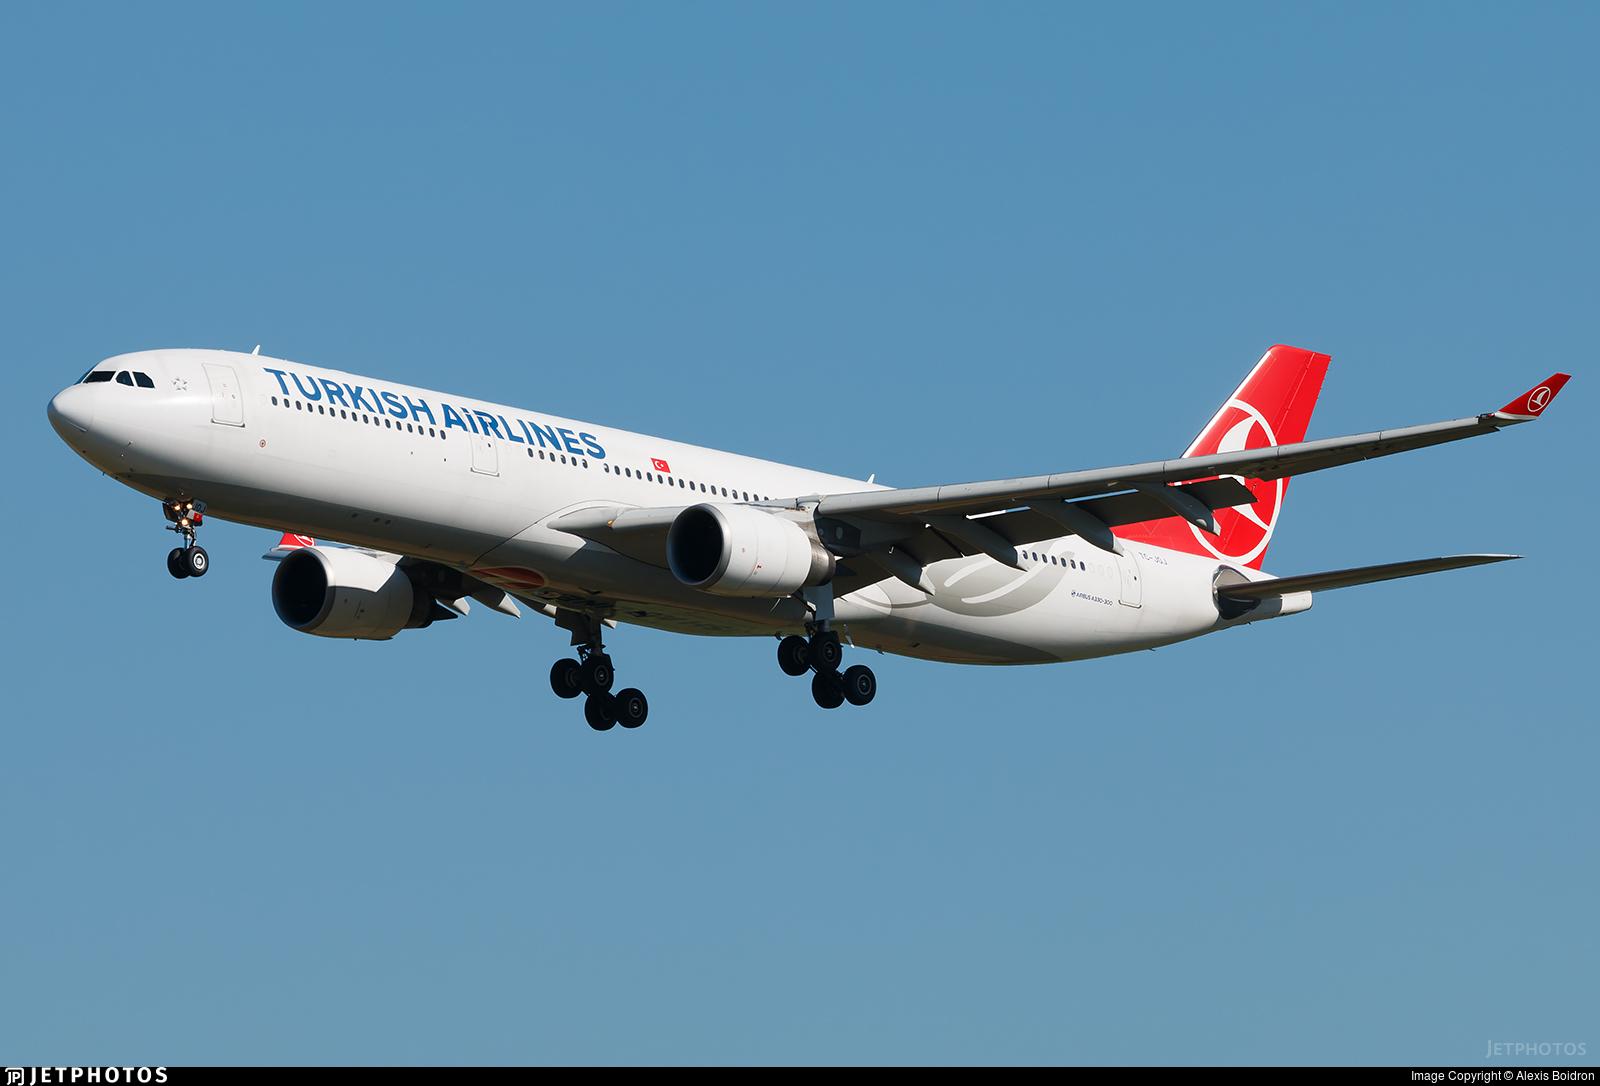 TC-JOJ - Airbus A330-303 - Turkish Airlines